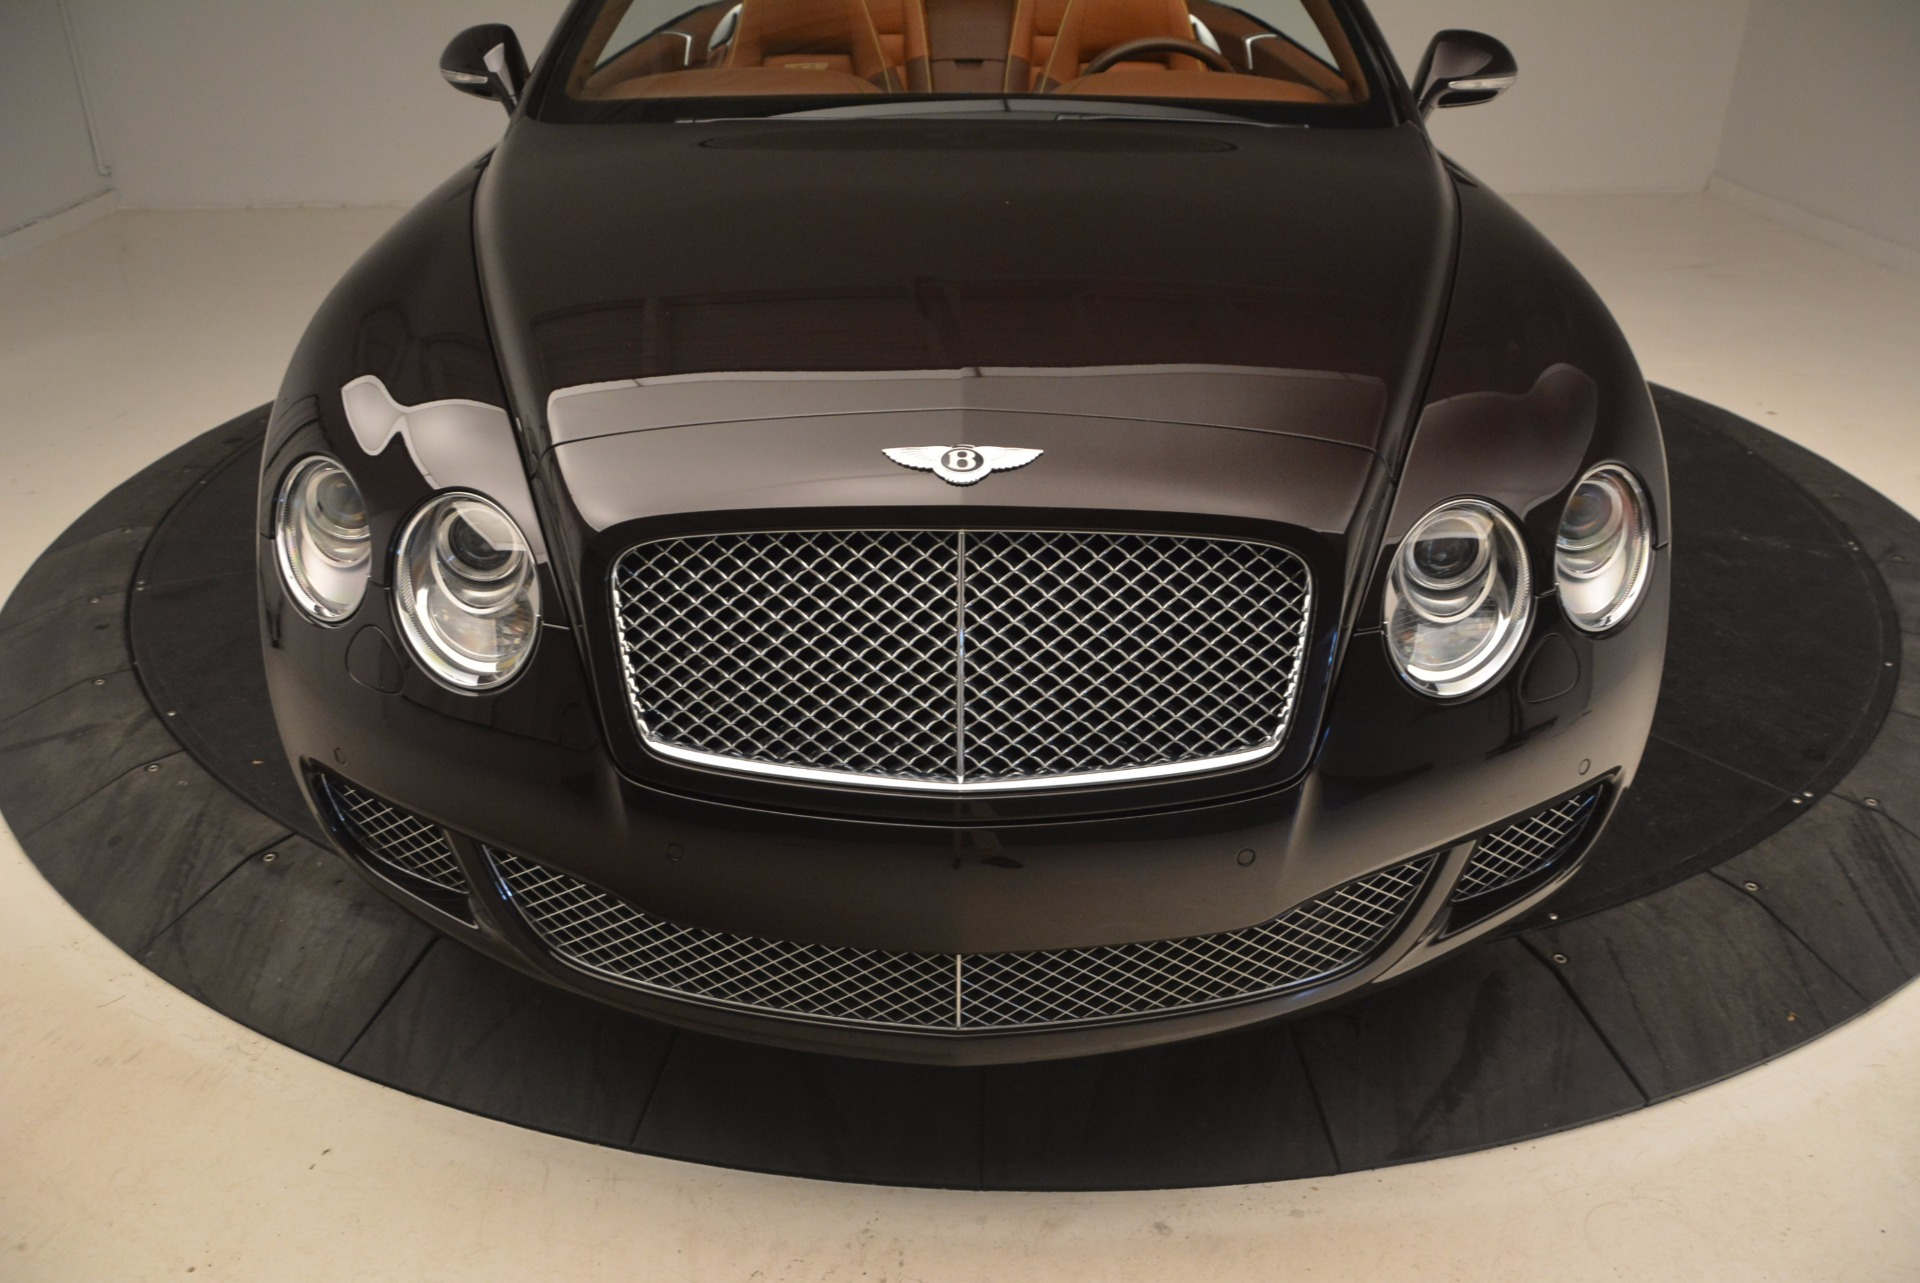 Used 2010 Bentley Continental GT Series 51 For Sale In Westport, CT 1222_p26